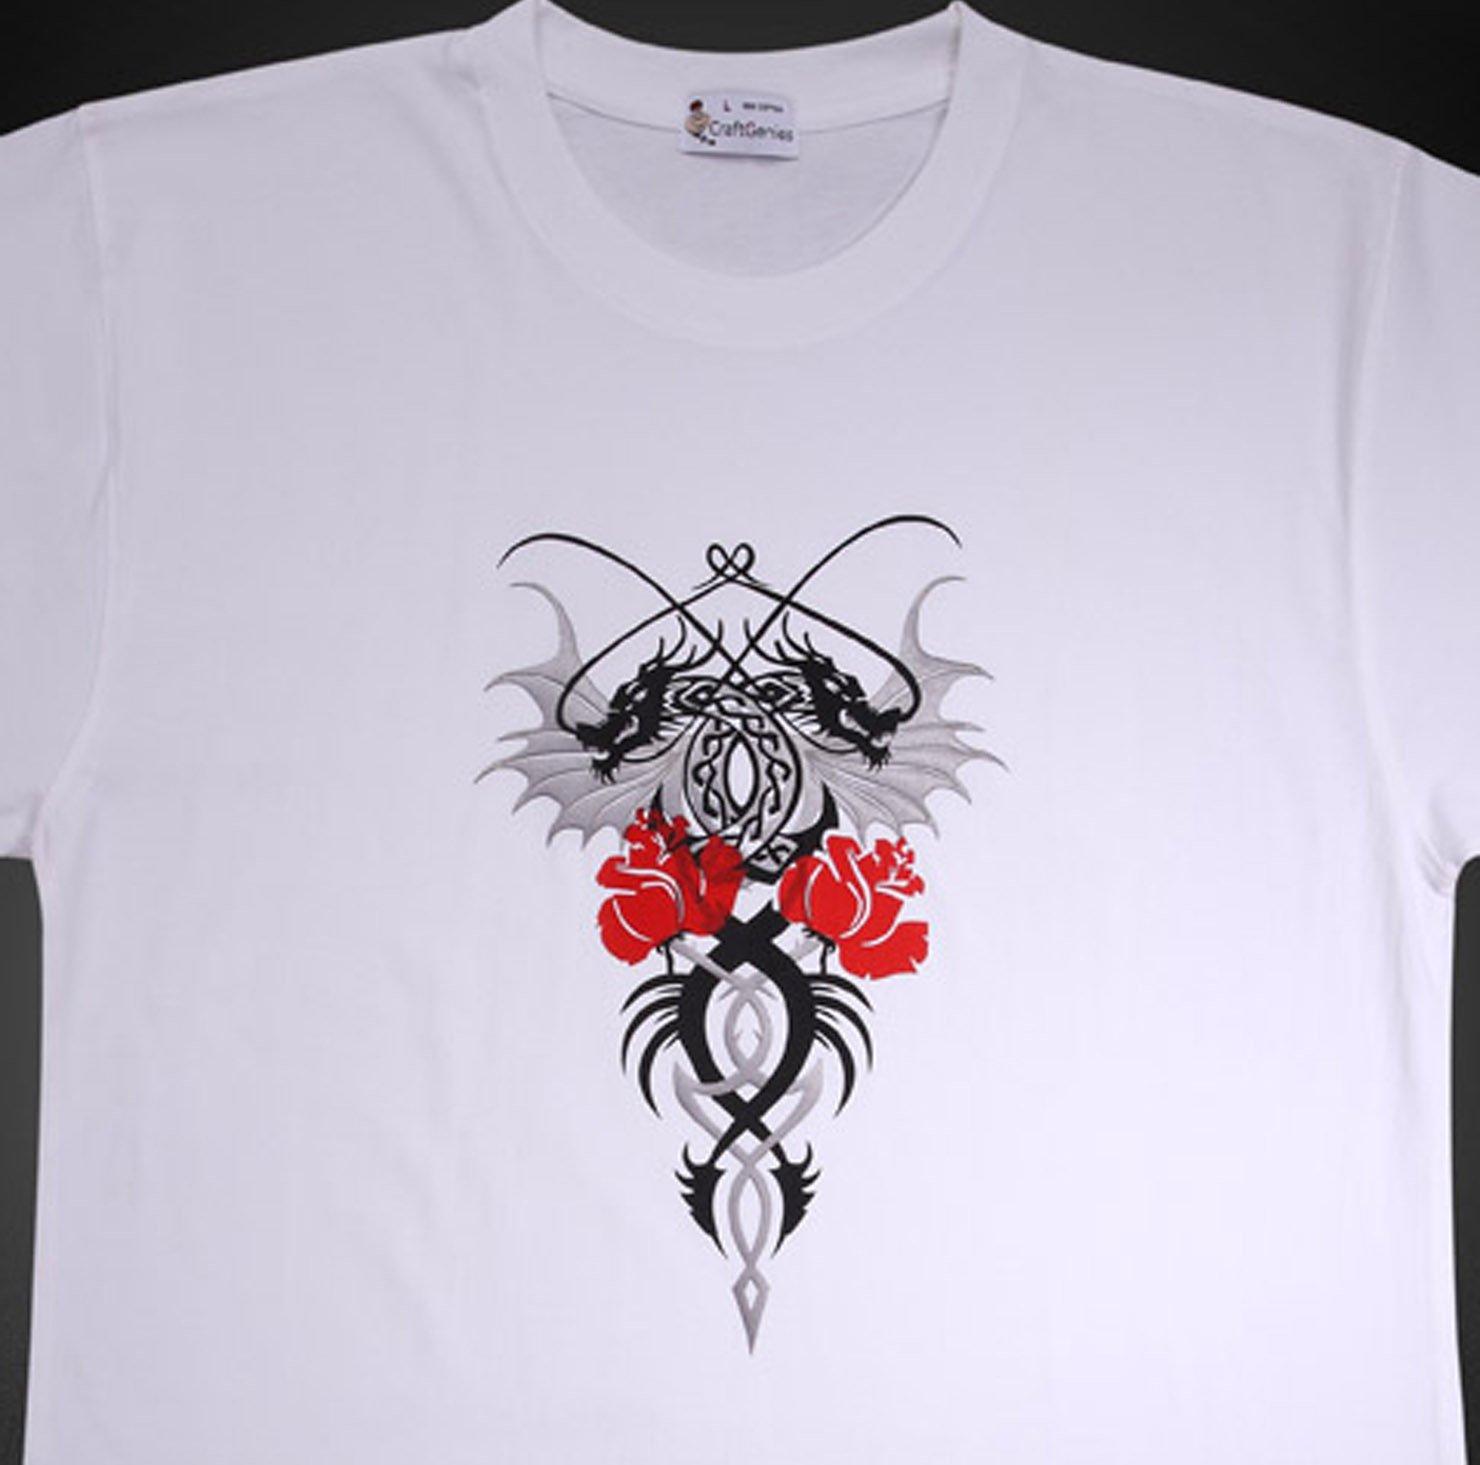 Animal Tee Dragon T Shirt Design for Men -Original Pack  (Men's XL)